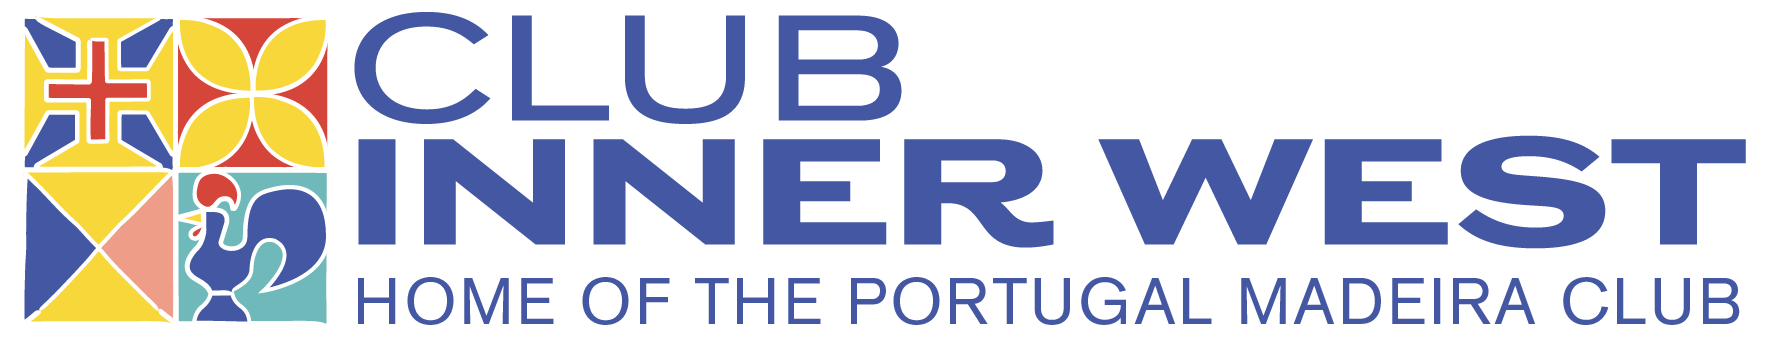 clubinnerwest.com.au